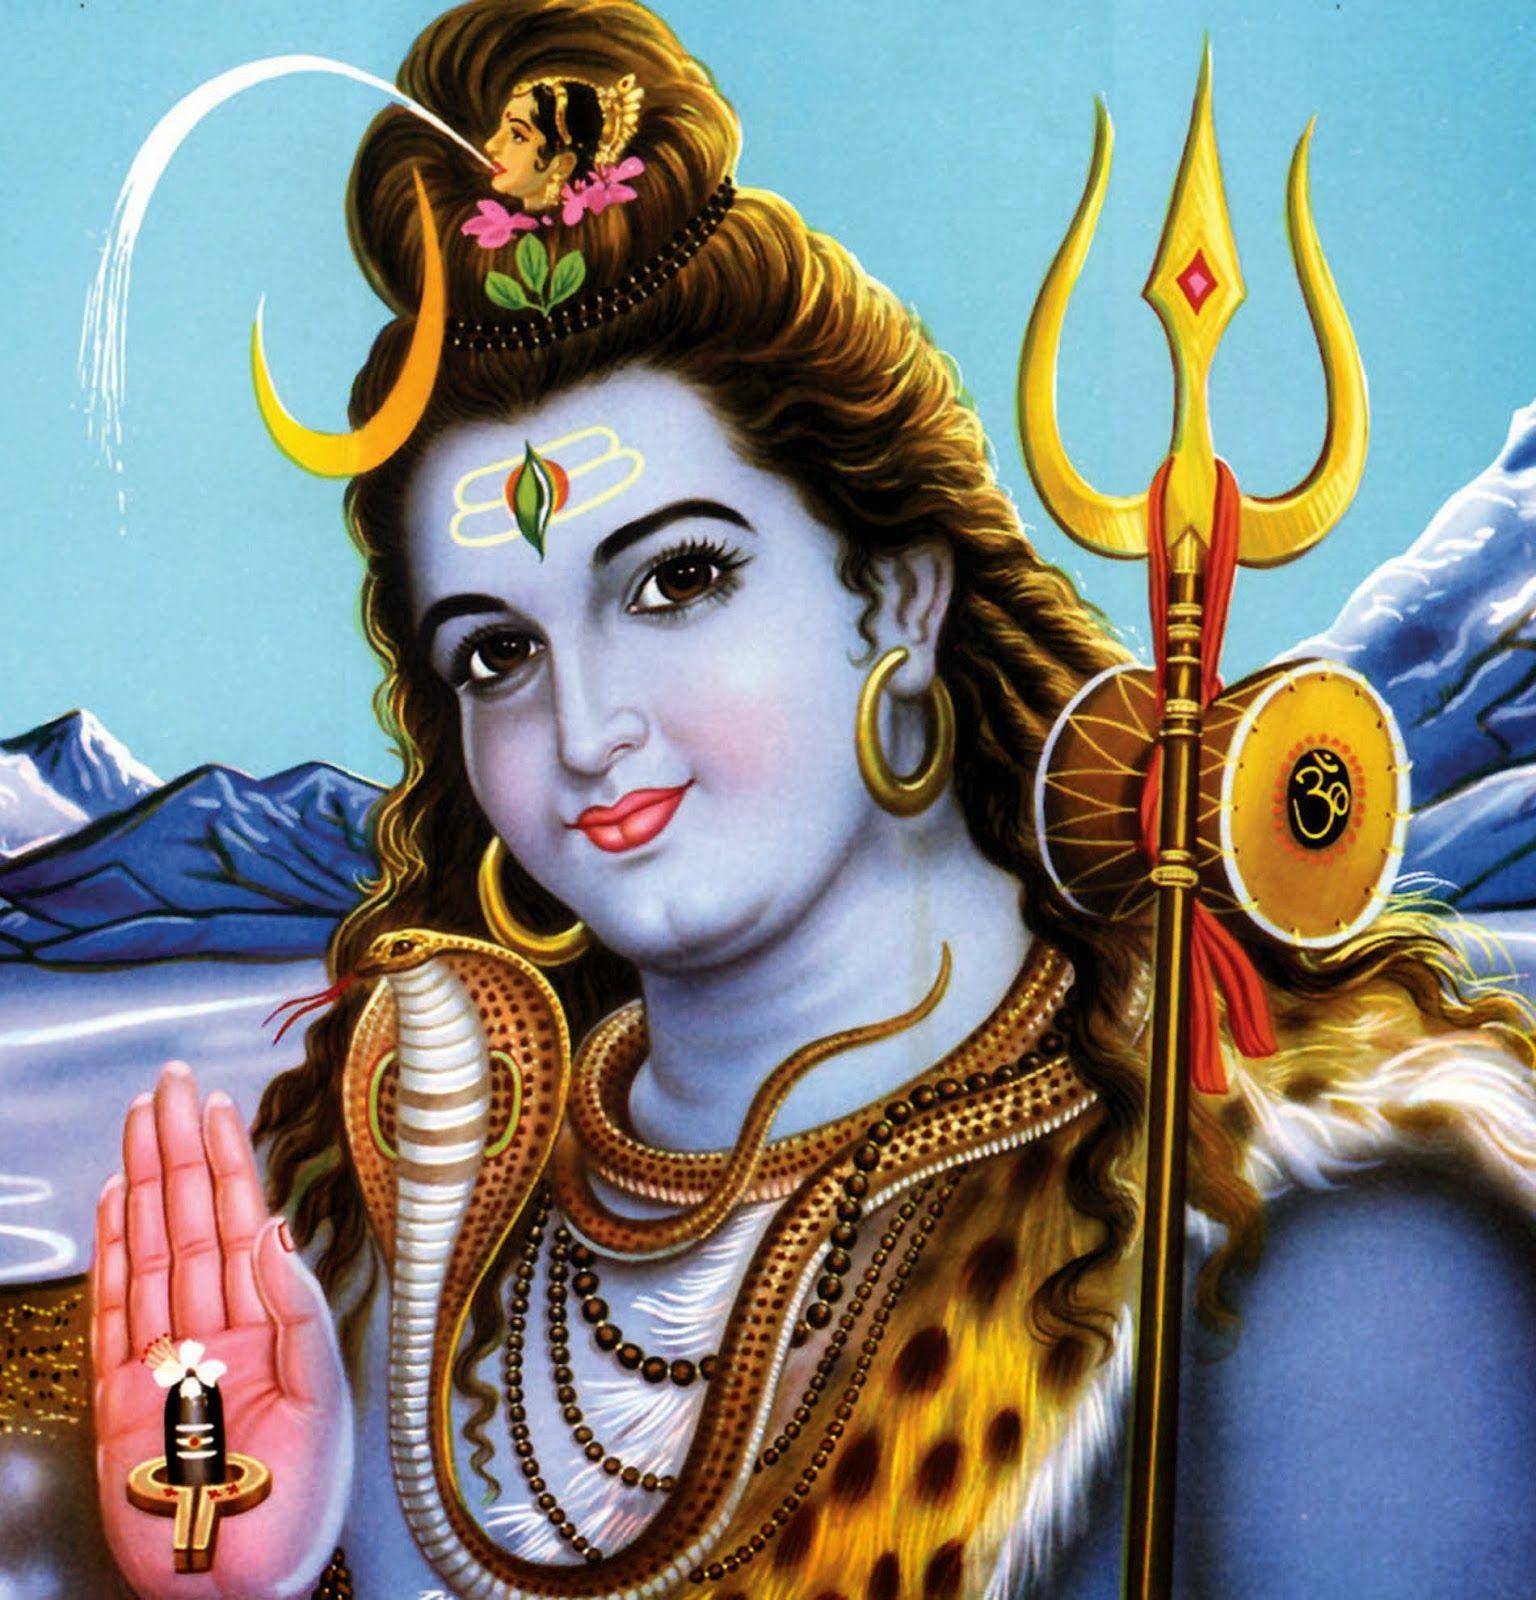 Bholenath Hindu God Shiva   Prayer   Pinterest   Shiva, Hindus and God